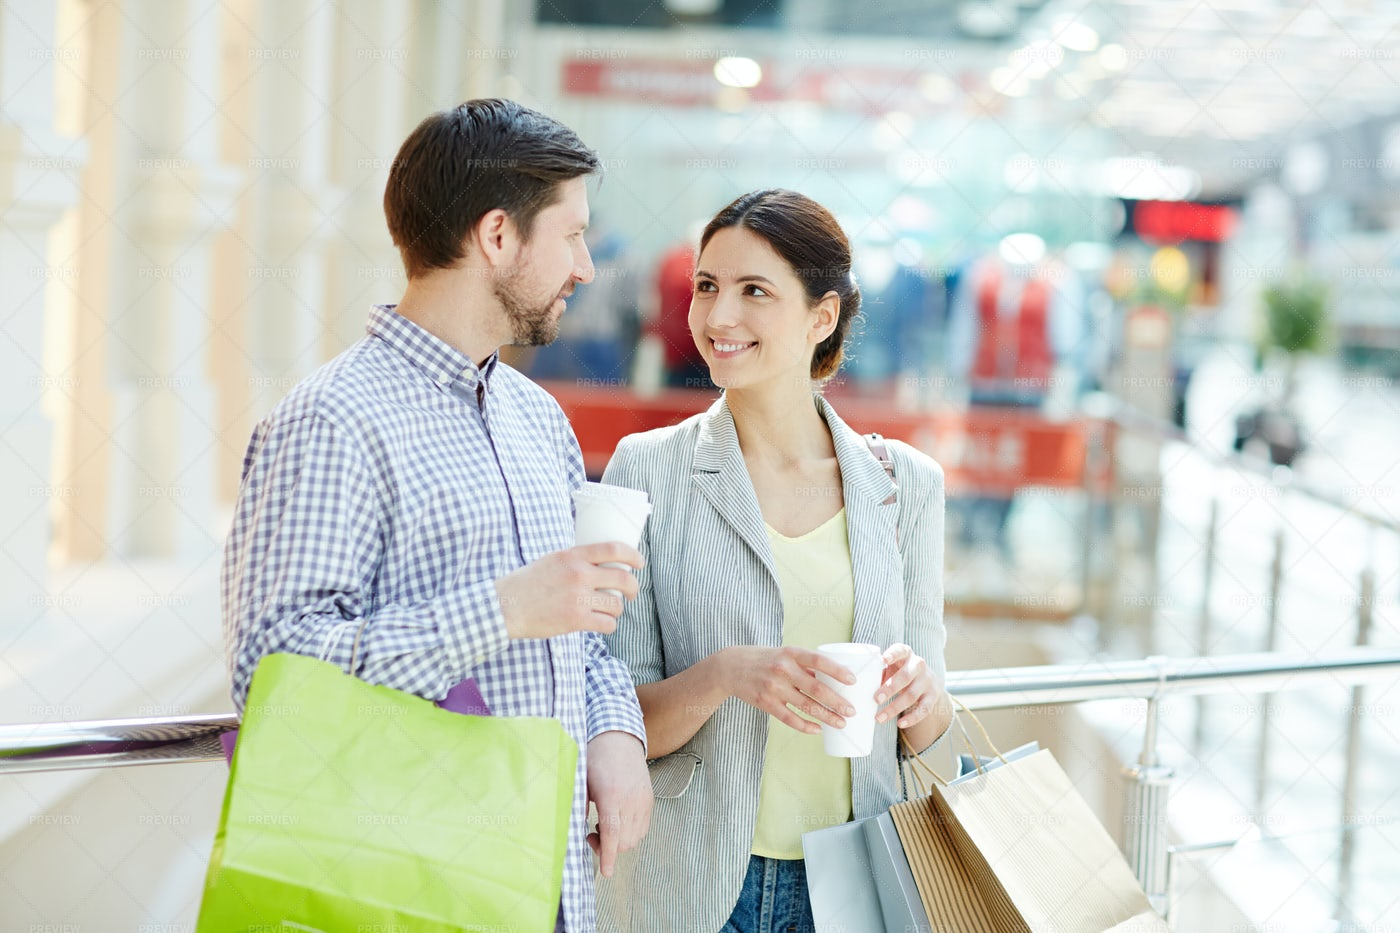 Young Shoppers: Stock Photos